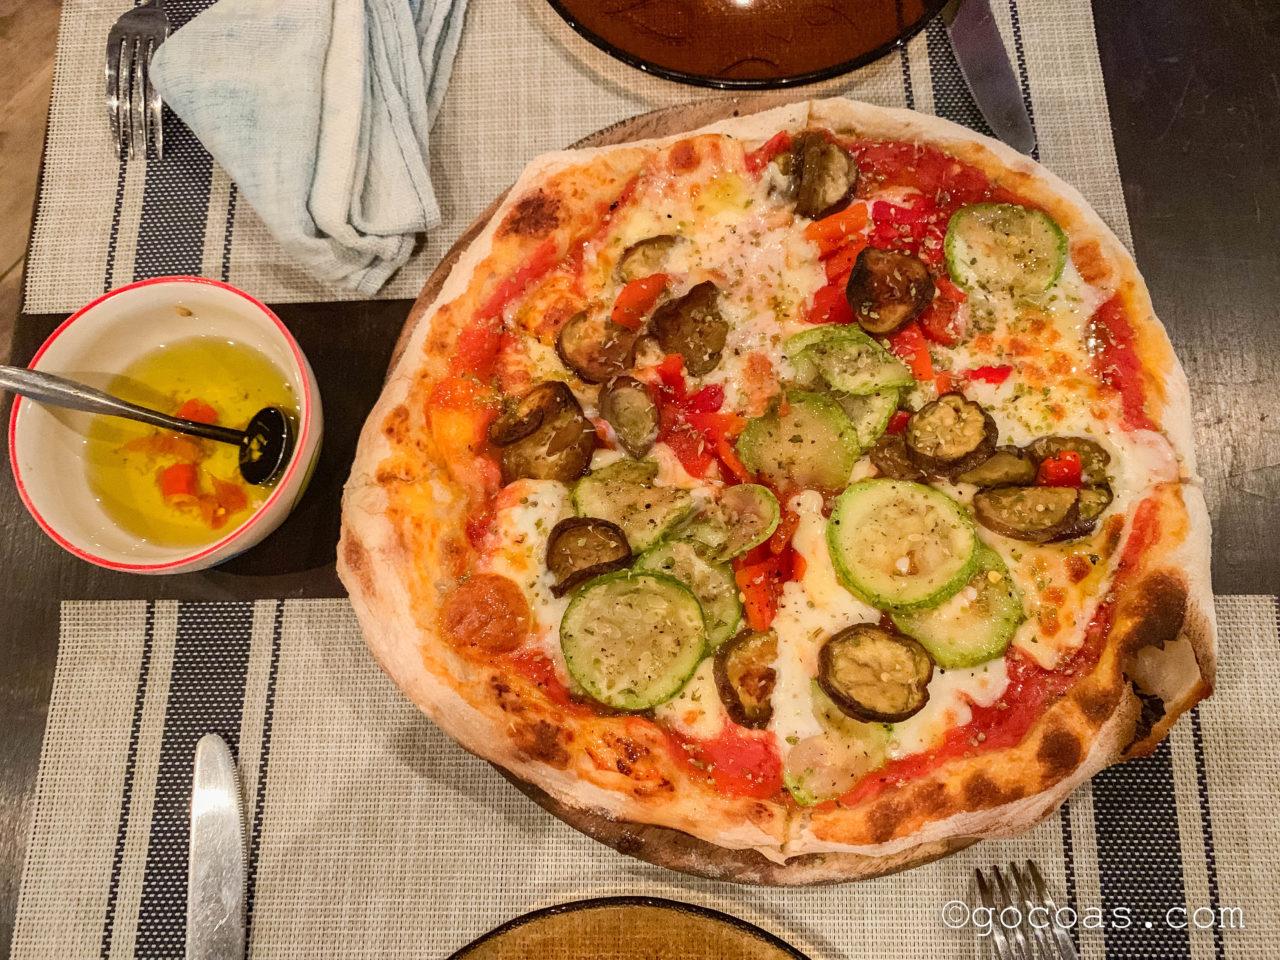 L'isola dei Nuraghiで食べたピザとオリーブオイルソース